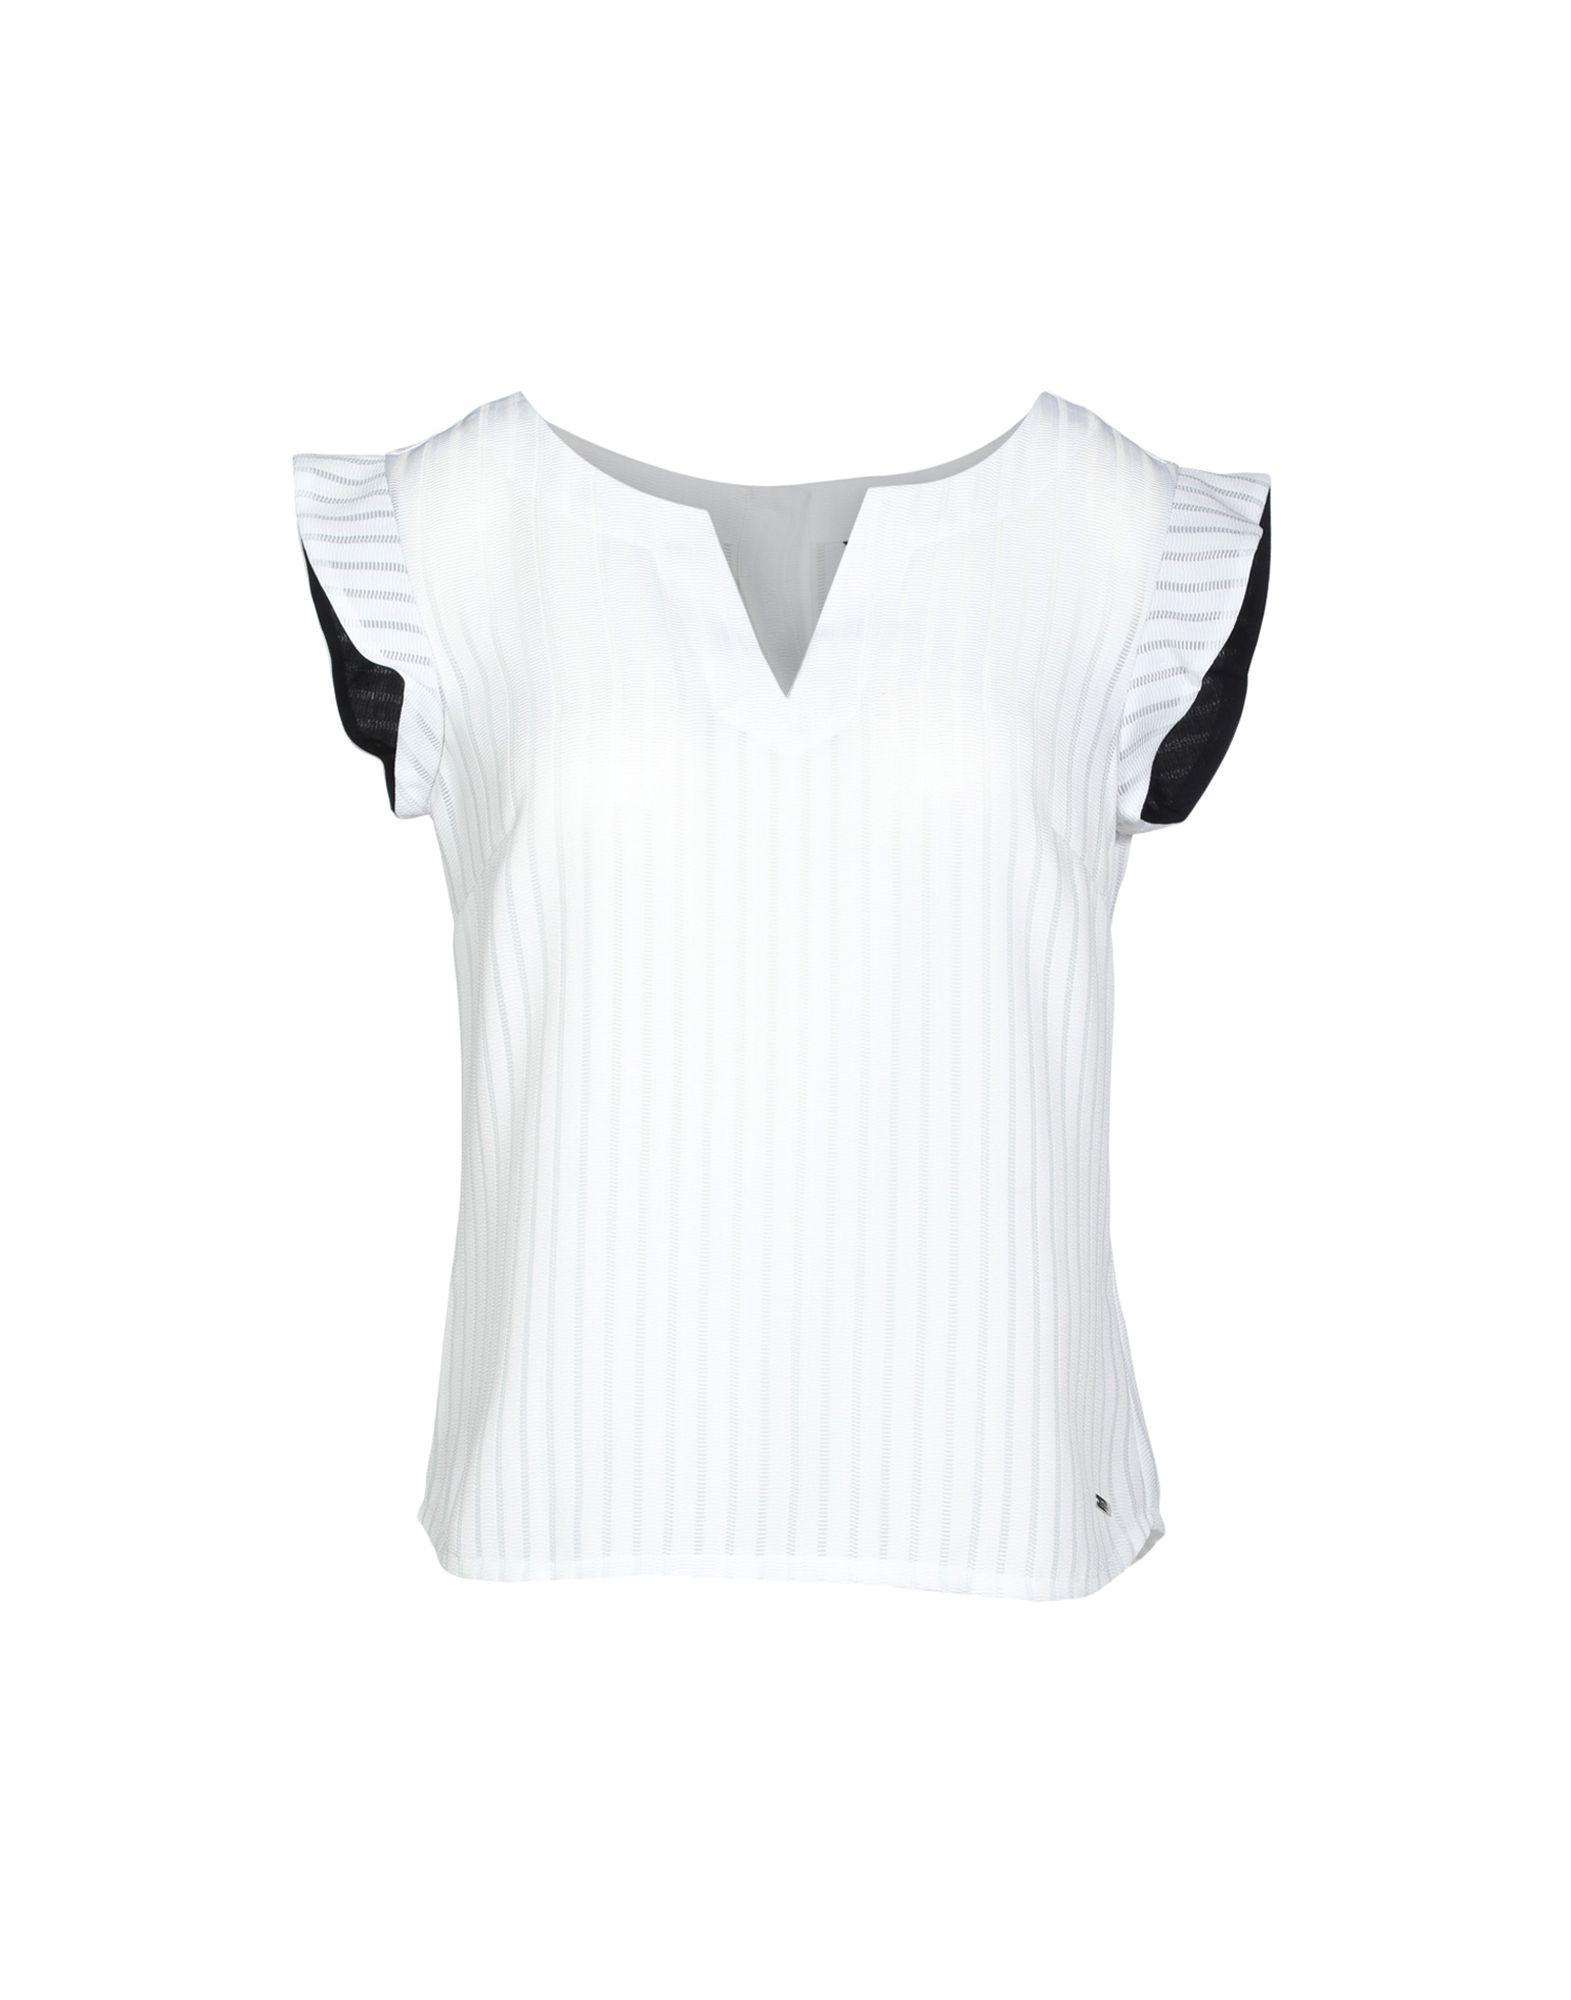 Armani Exchange Blouse In White